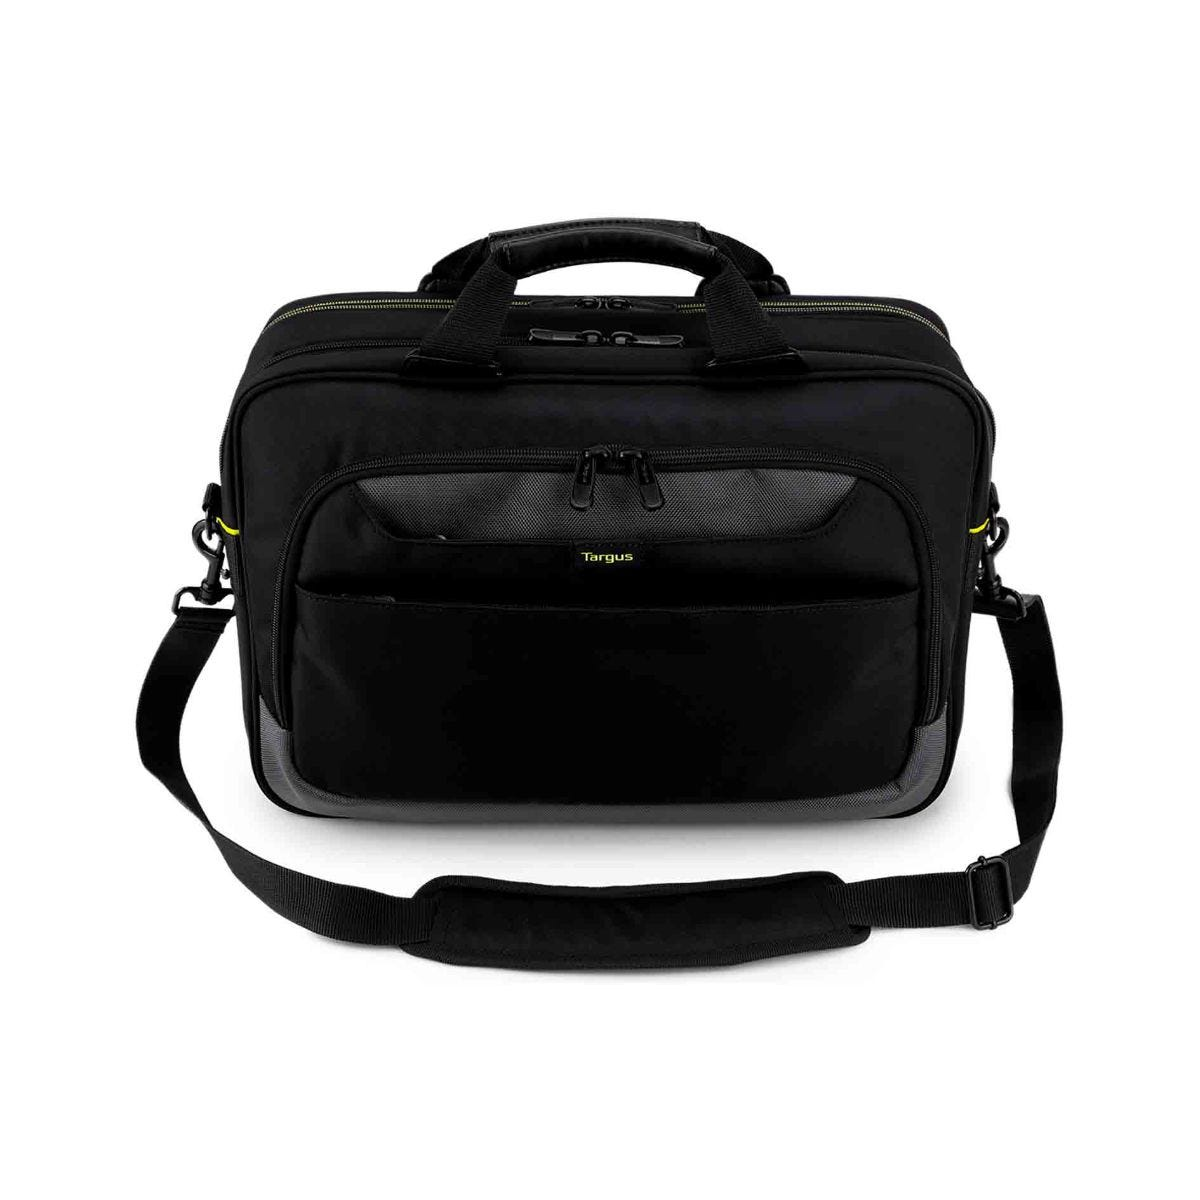 Image of Targus CityGear Topload Laptop Case 17.3 Inch, Black